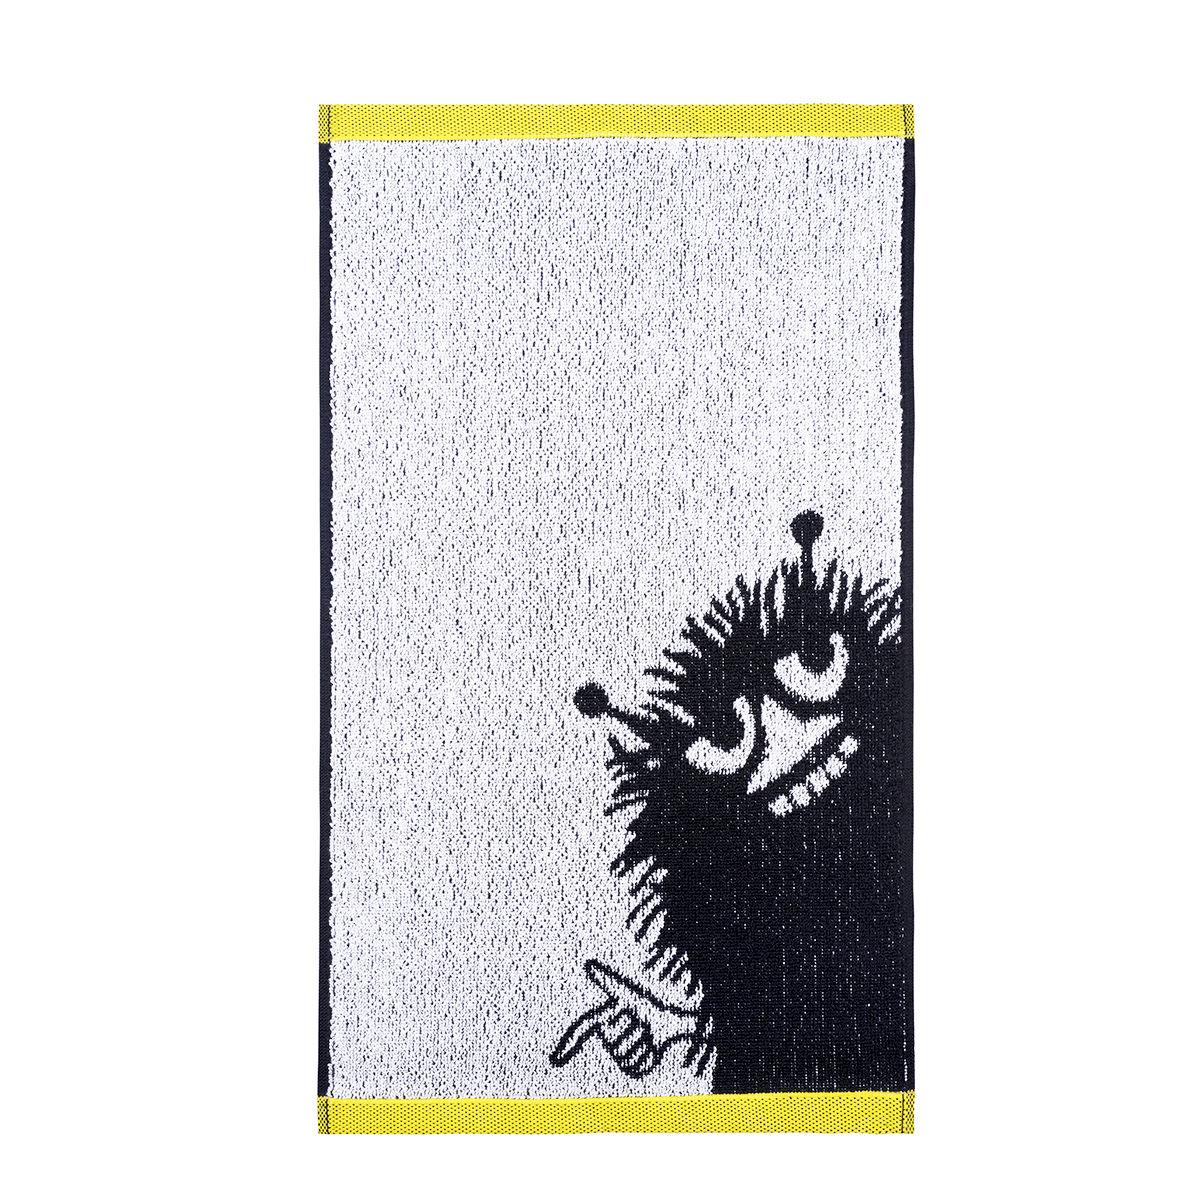 Stinky handduk svart/vit/gul Finlayson